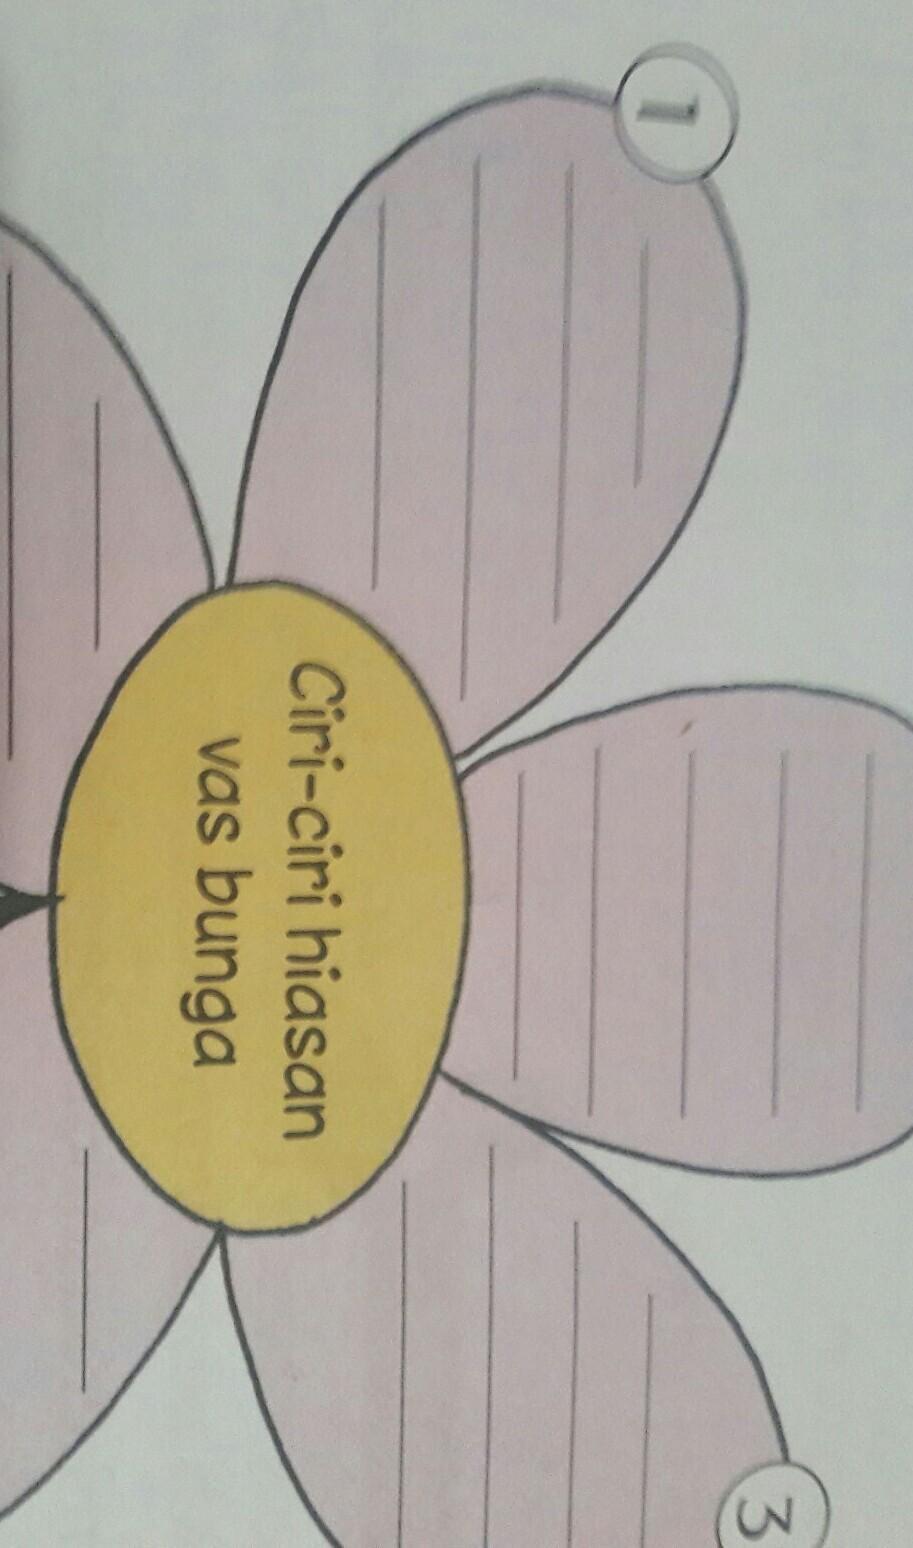 Apa Kah Ciri Ciri Hiasan Vas Bunga Brainly Co Id